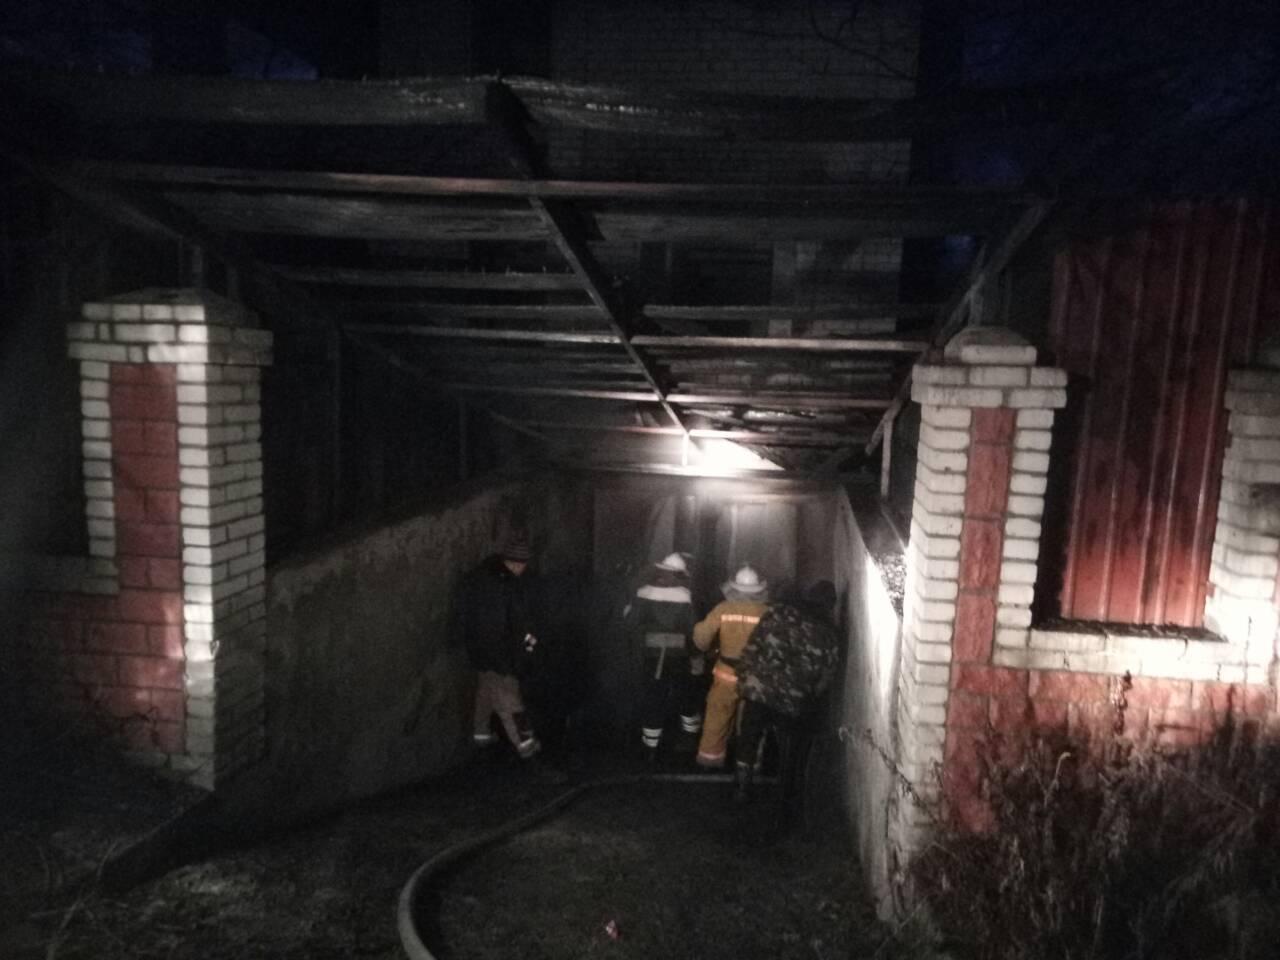 Бориспільщина: дві пожежі за два дні -  - yzobrazhenye viber 2019 12 02 08 48 07